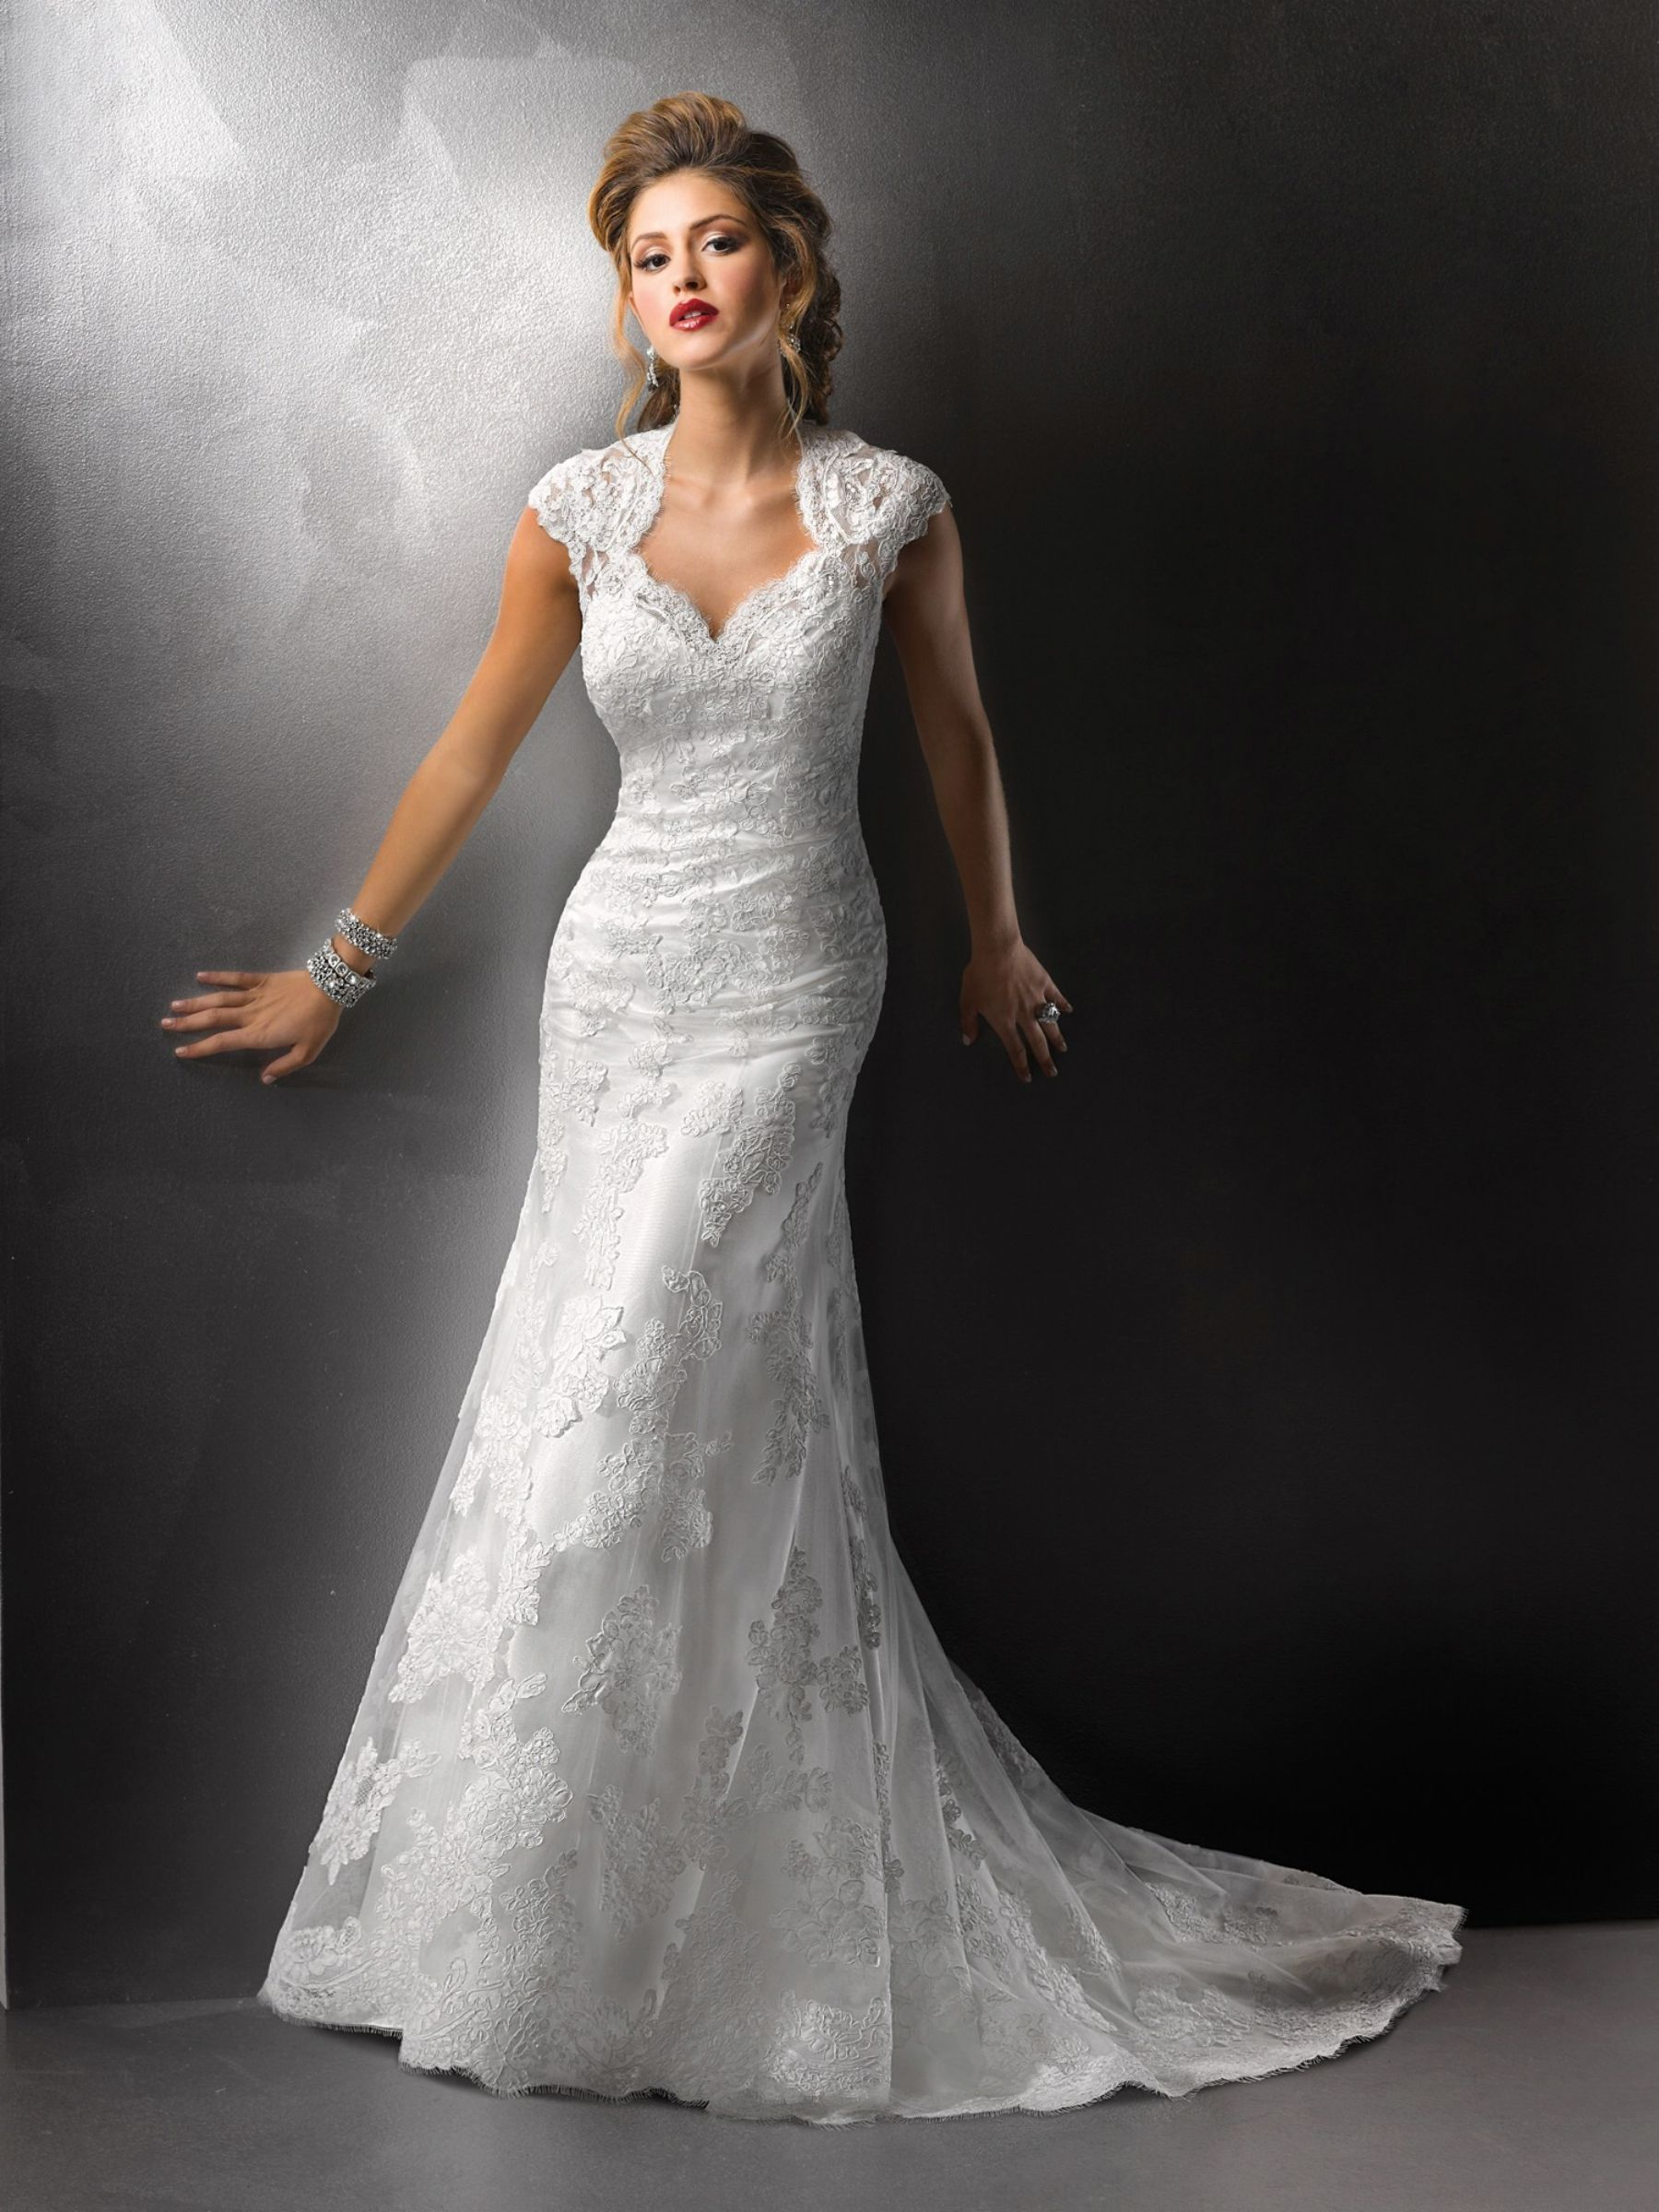 Cheap Wedding Dresses Online Under 100 My Wedding Ideas